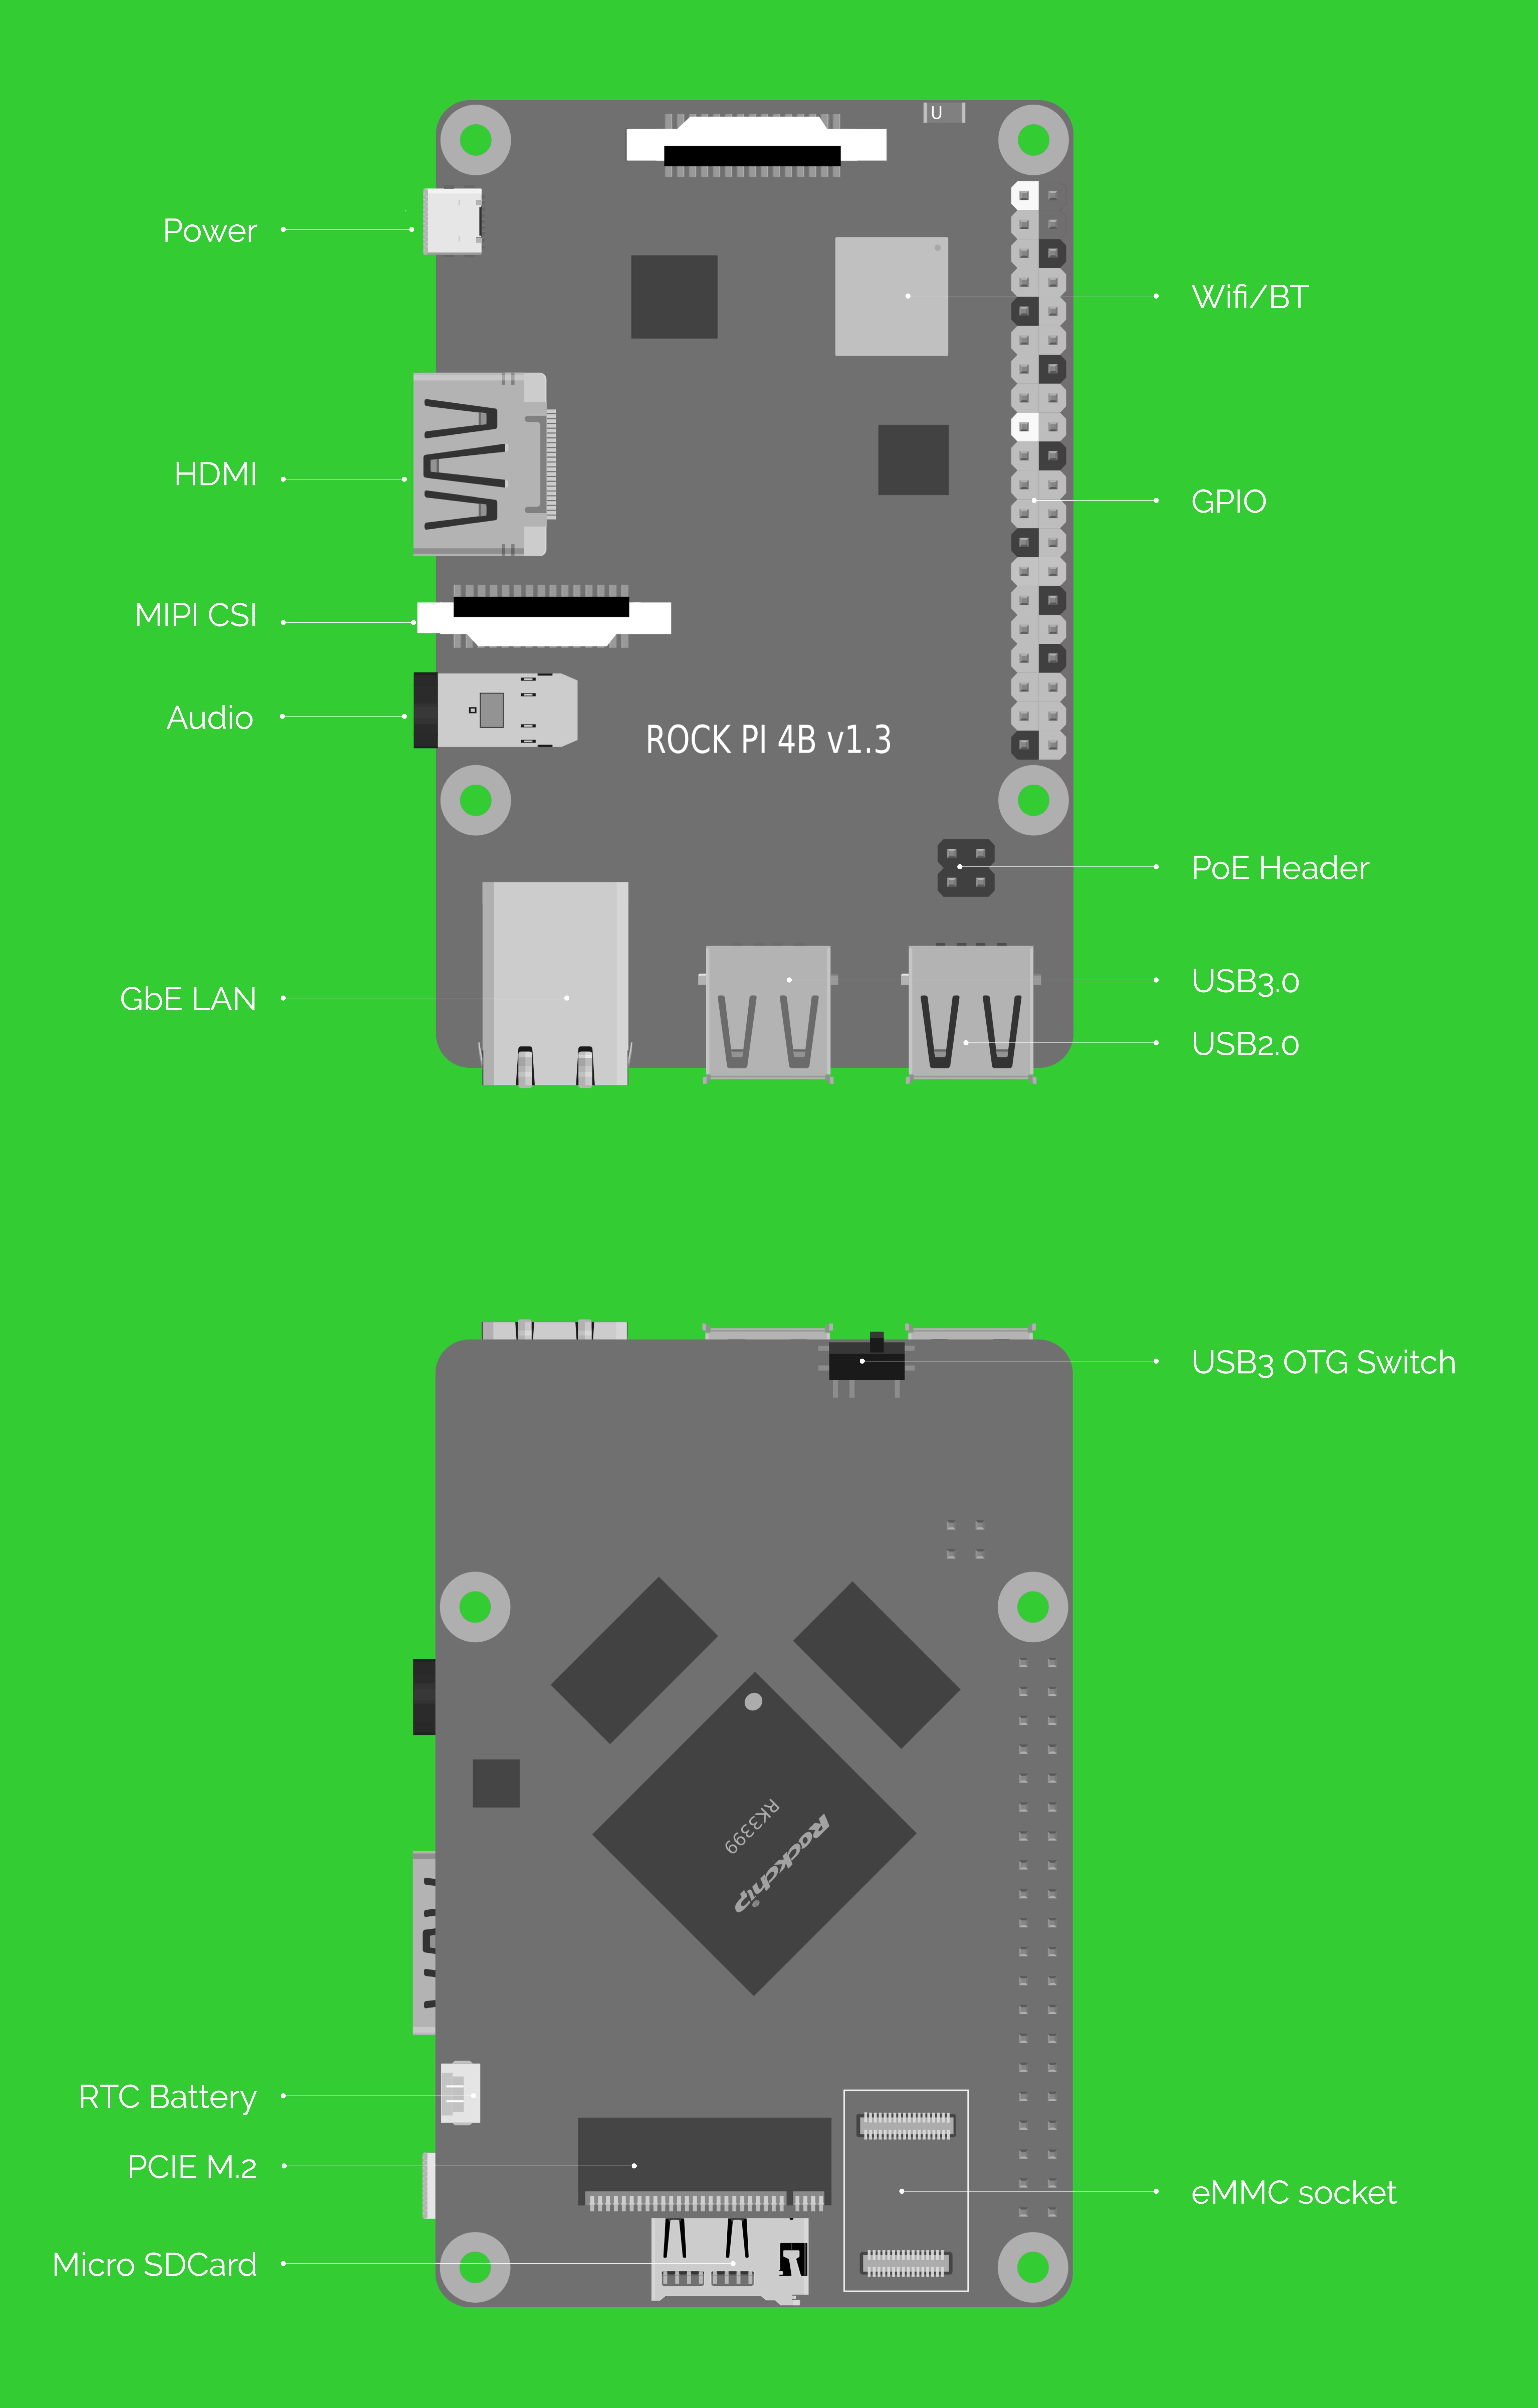 RADXA ROCK Pi 4B، راک پای 4 ، پردازنده RK3399